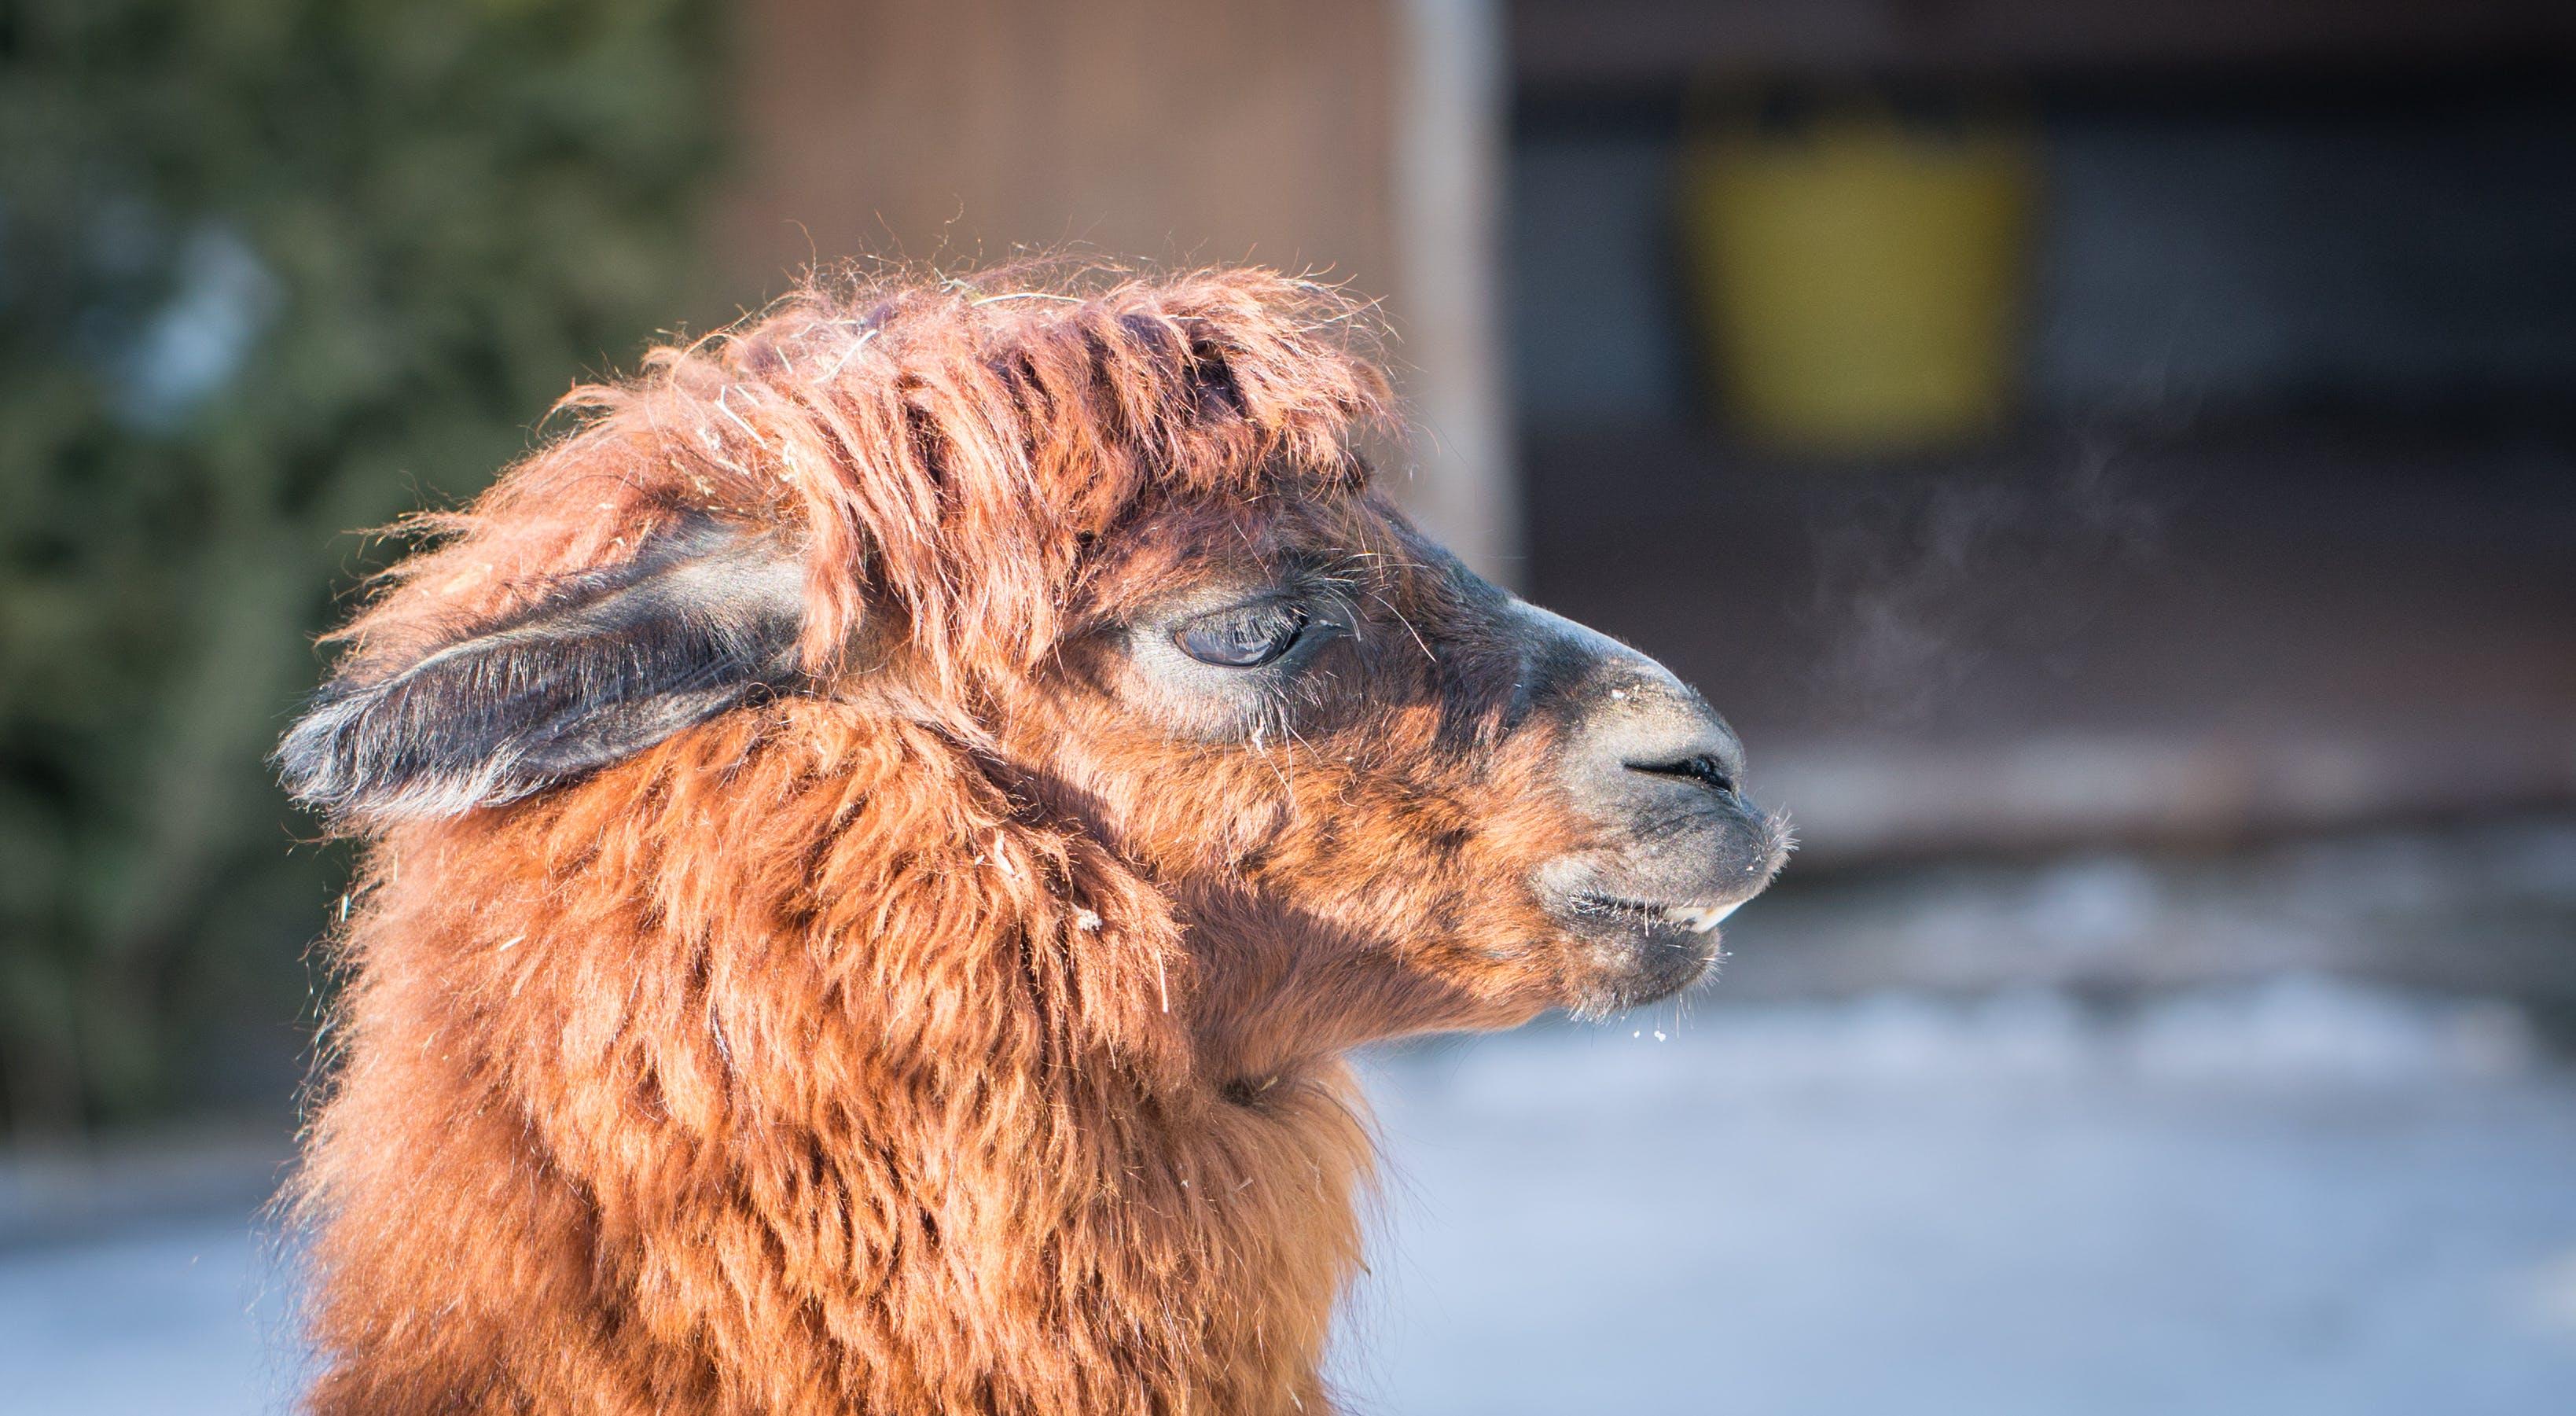 Macro Photography of Llamas Head